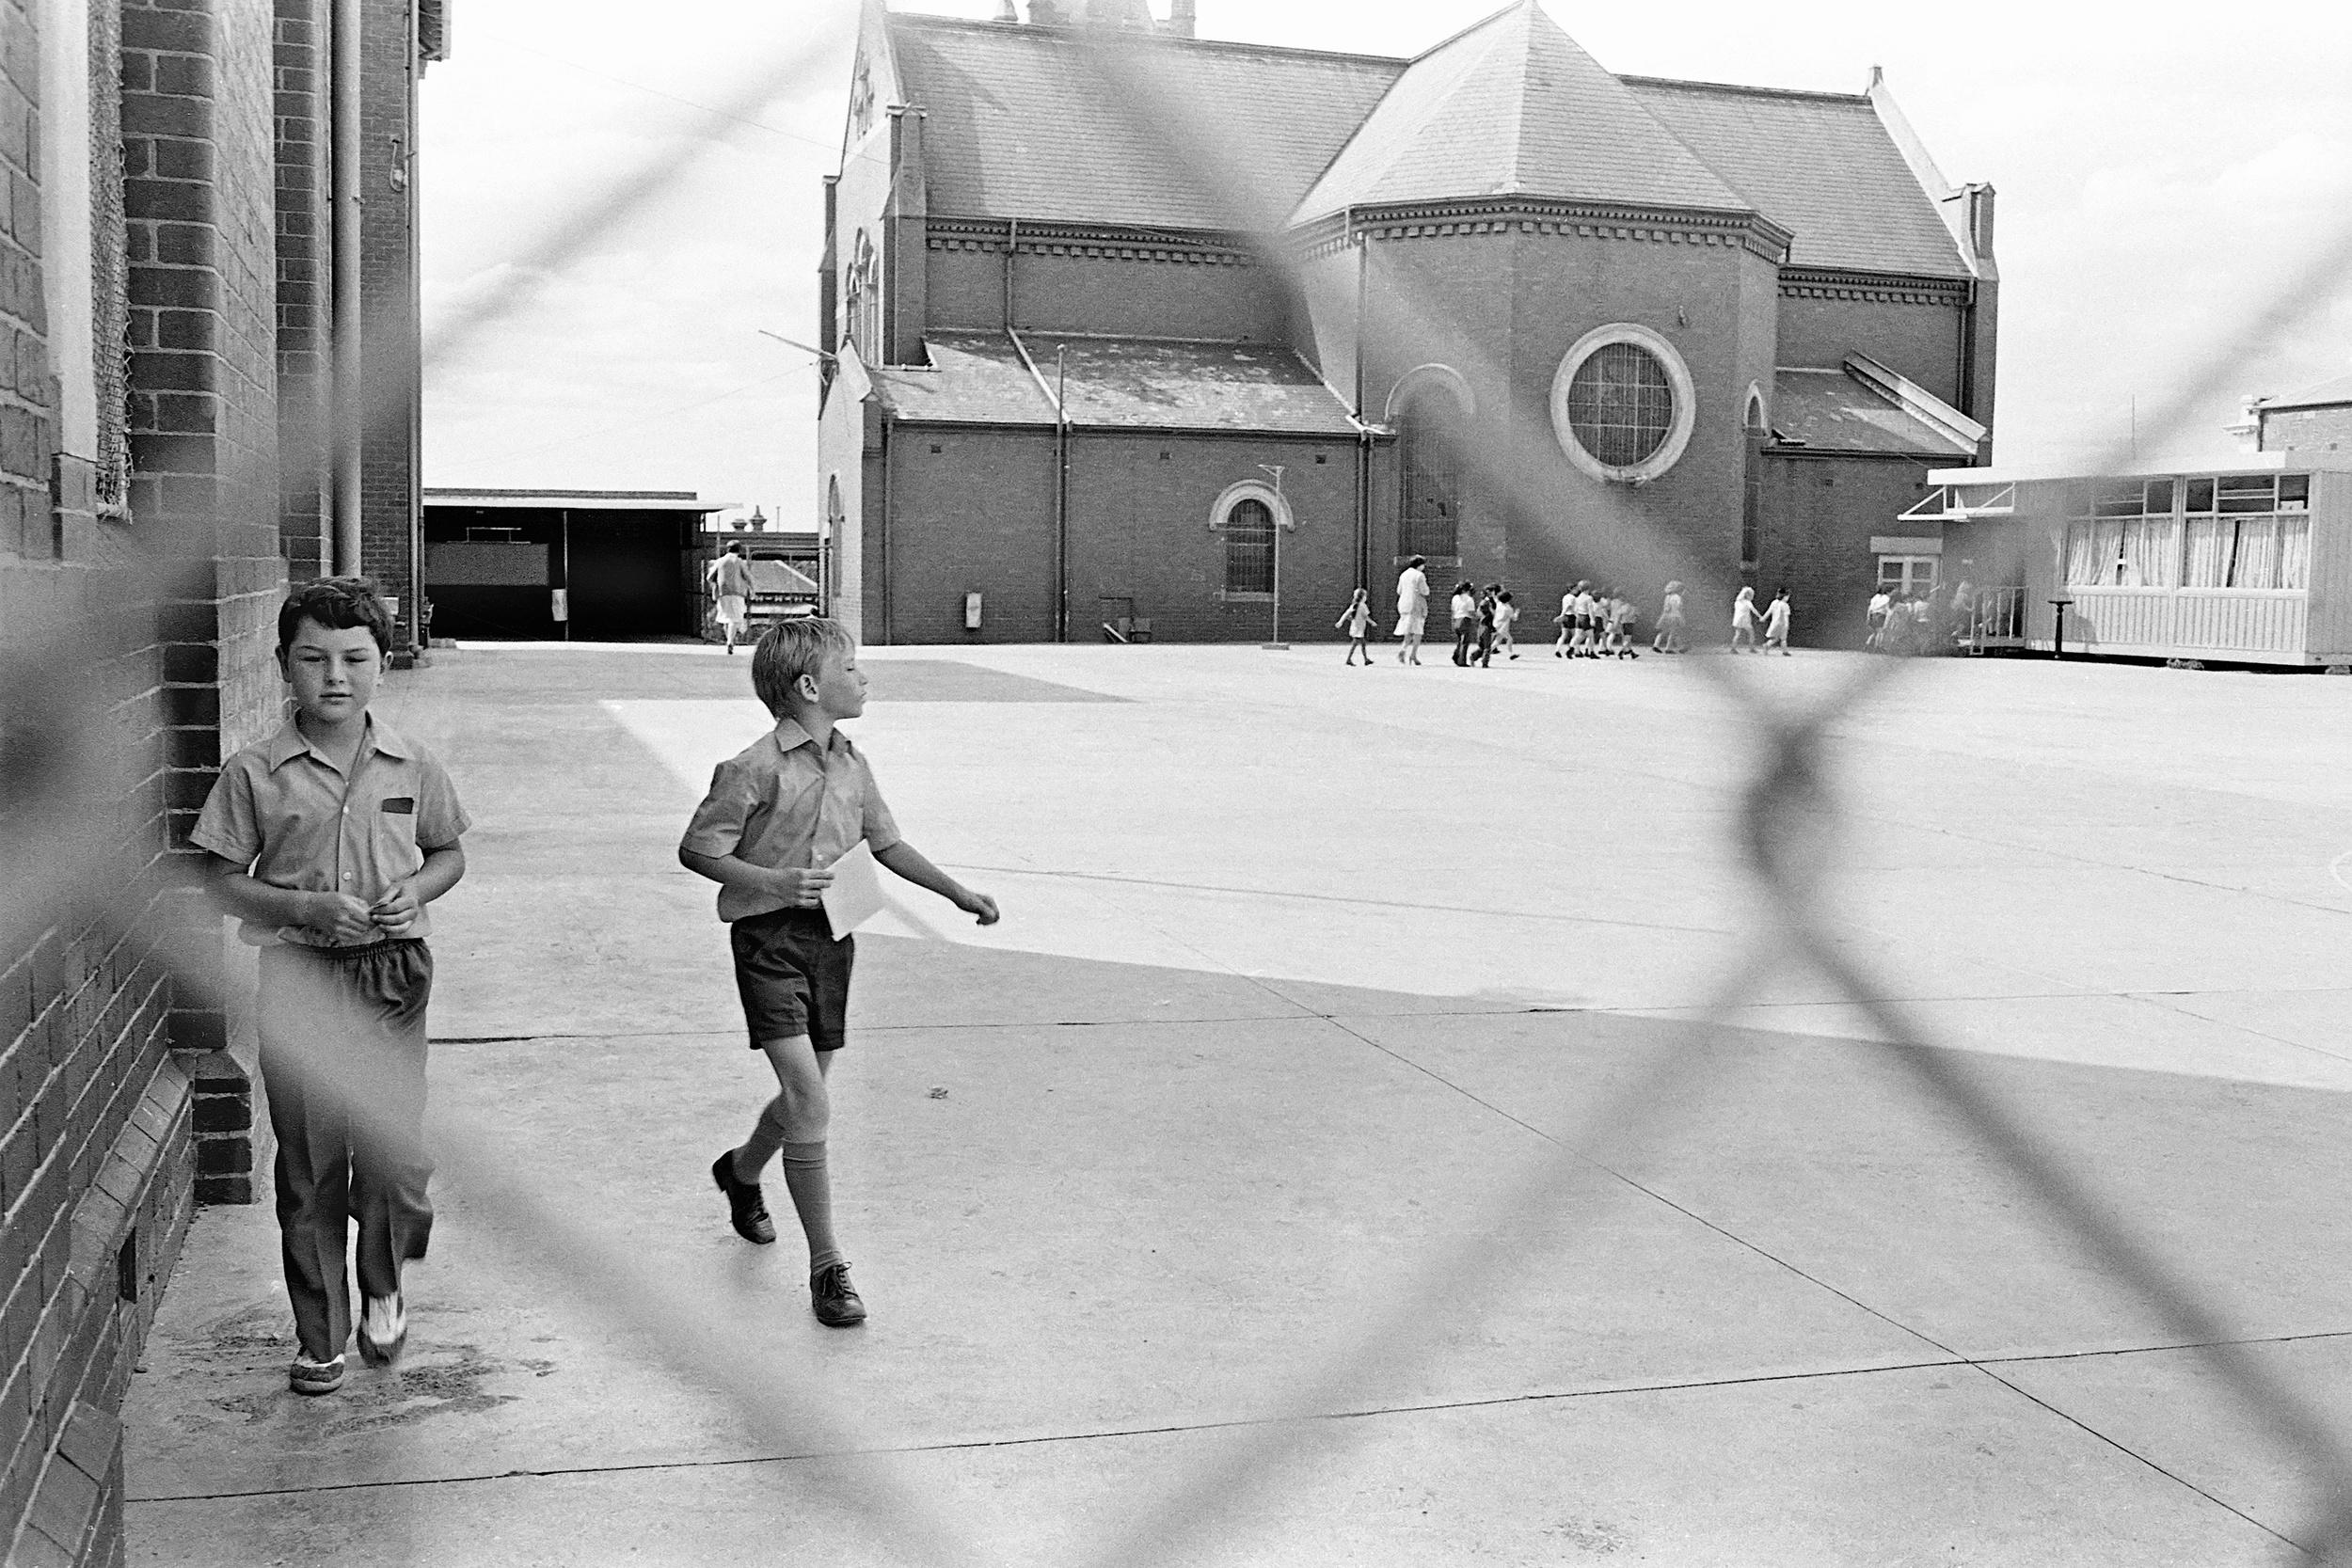 David Wadelton, Primary School, Northcote, 1977